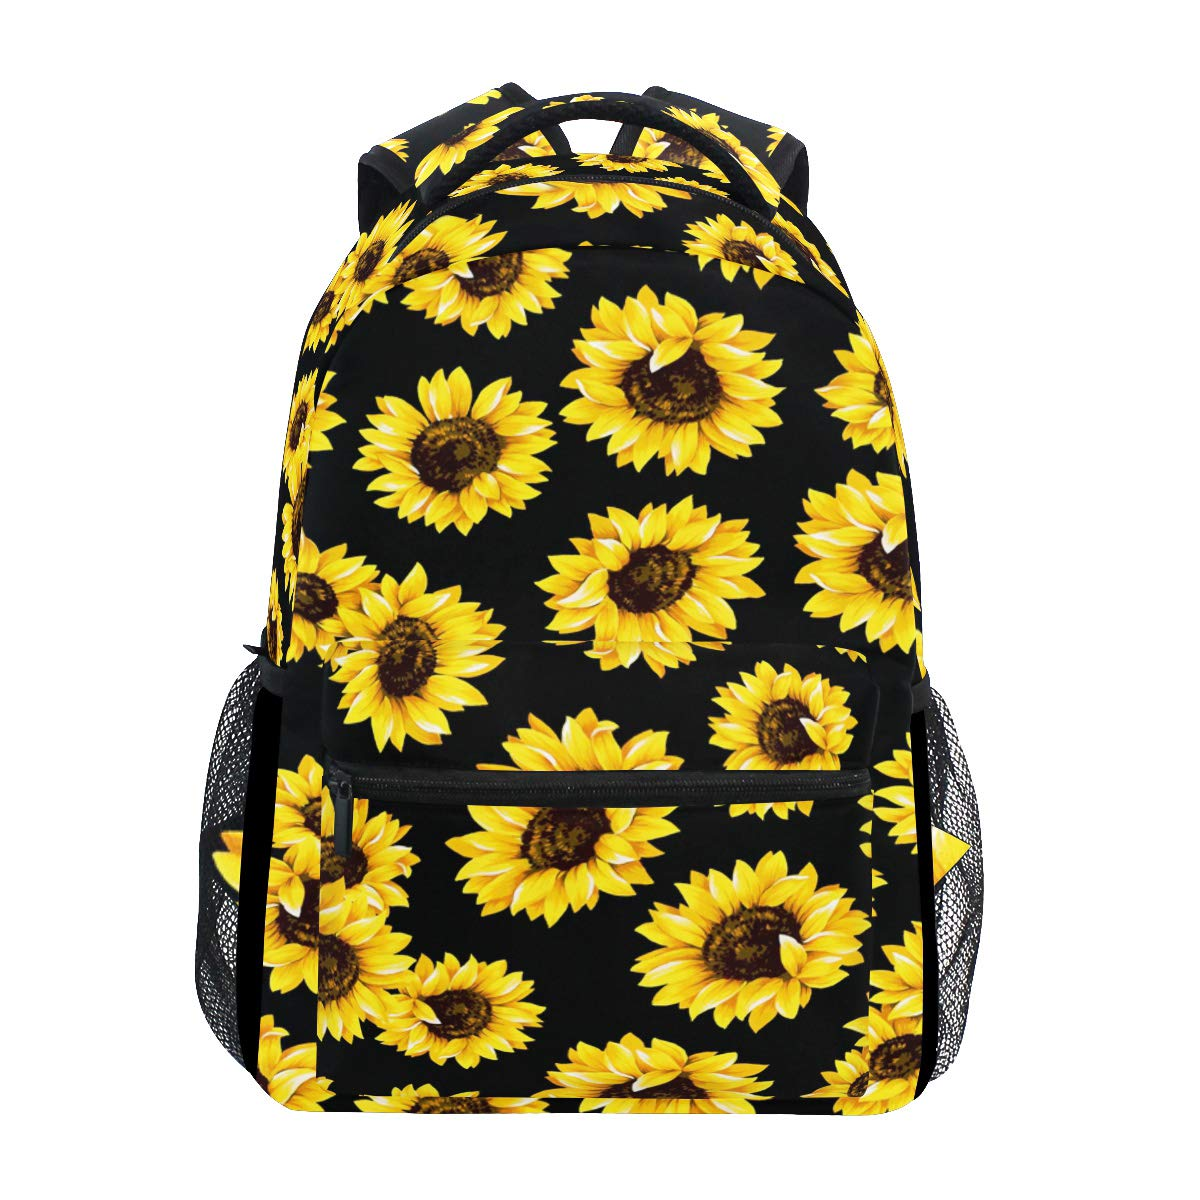 Sunflower Floral Laptop Backpack, Flower on Black Water Resistant College Students Bookbags Elementary School Bags Travel Computer Notebooks Daypack Bookbag for Men Women Kids Boys Girls